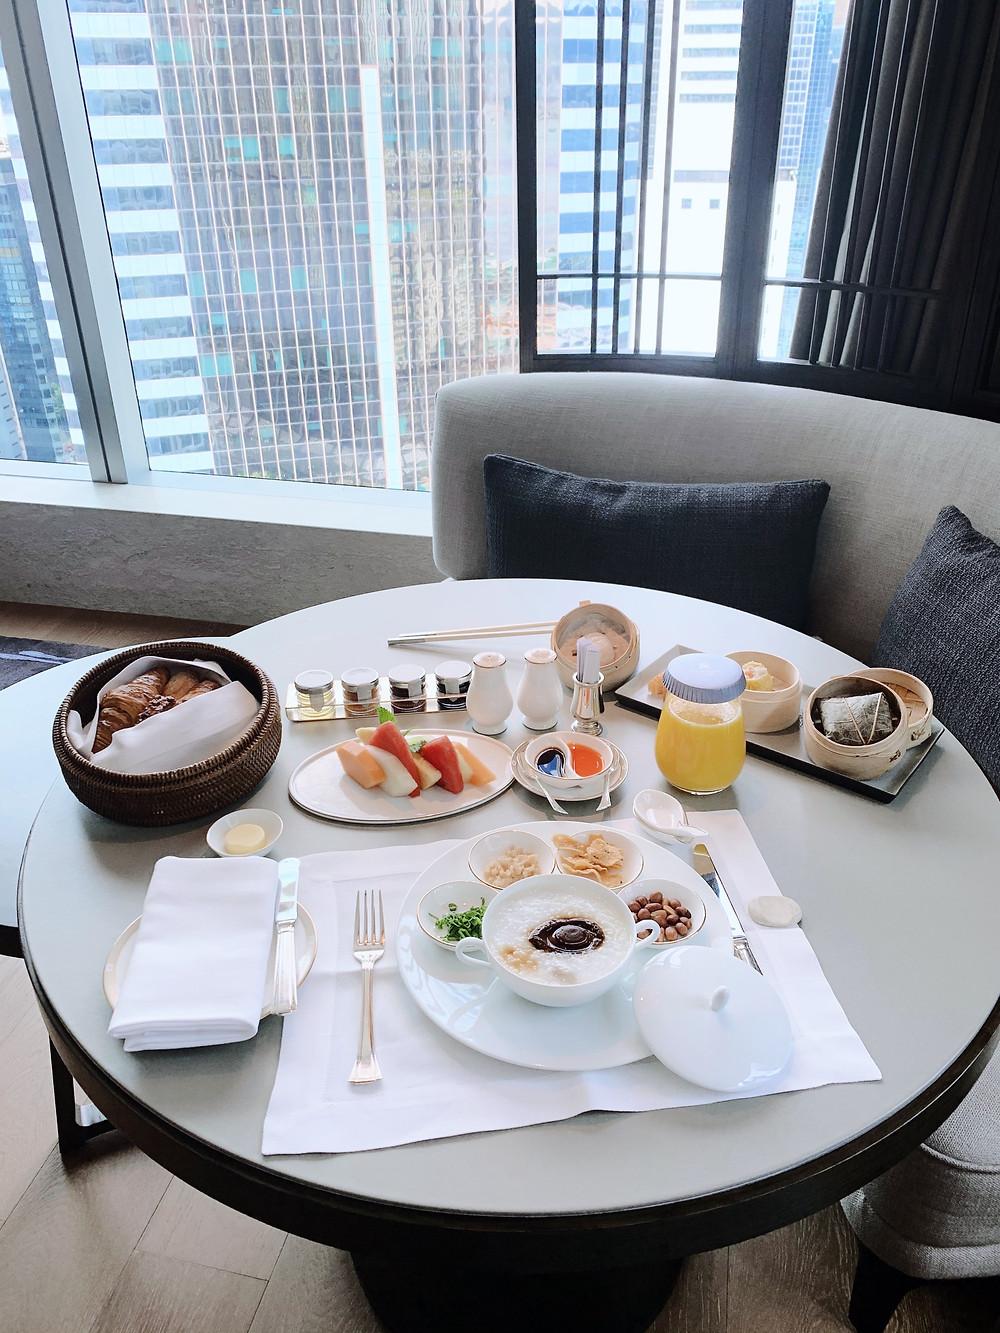 Breakfast at St Regis HK Hong Kong